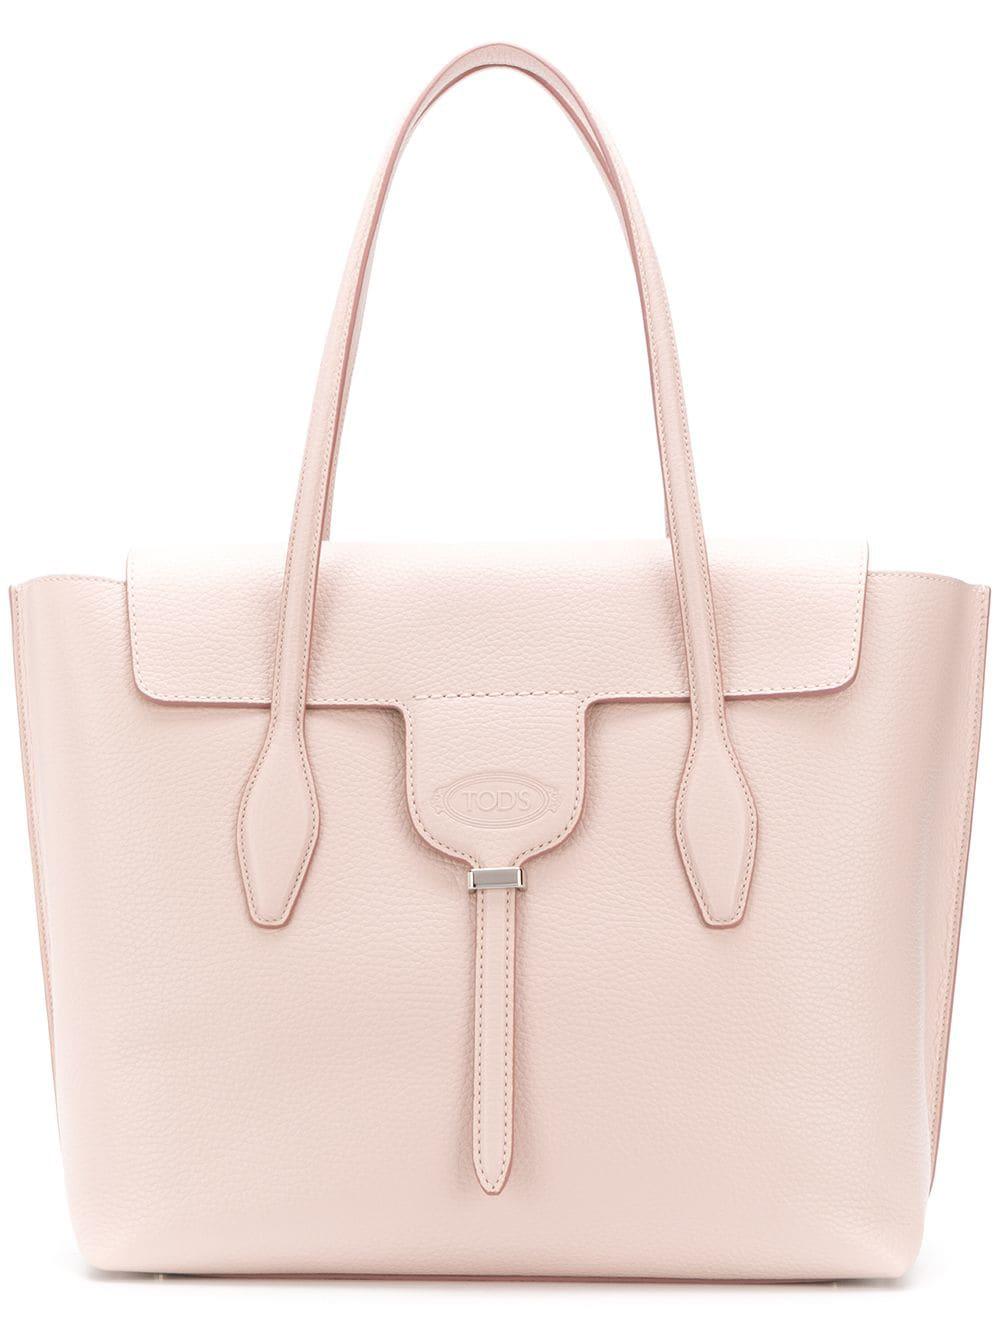 b5c36dde80 Tod's Joy Medium Tote Bag - Pink   ModeSens